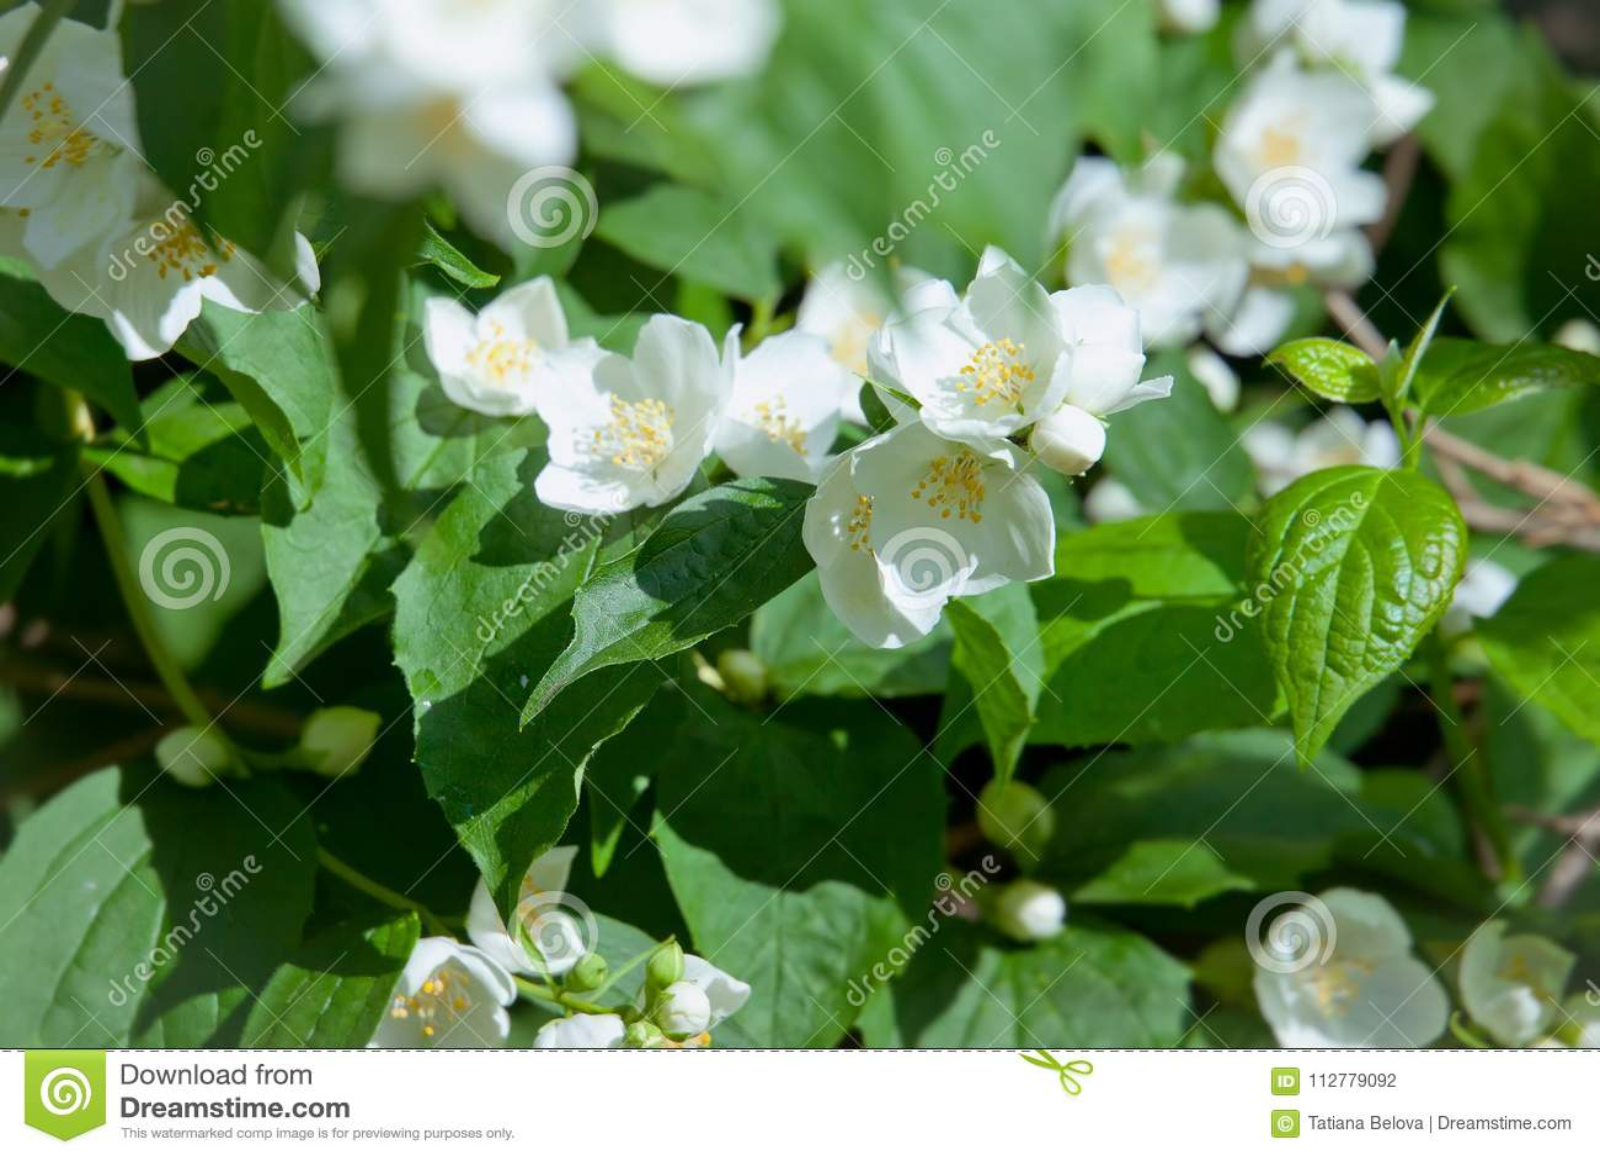 White Garden Flowers Of Jasmine In Sunny Summer Day Stock Photo